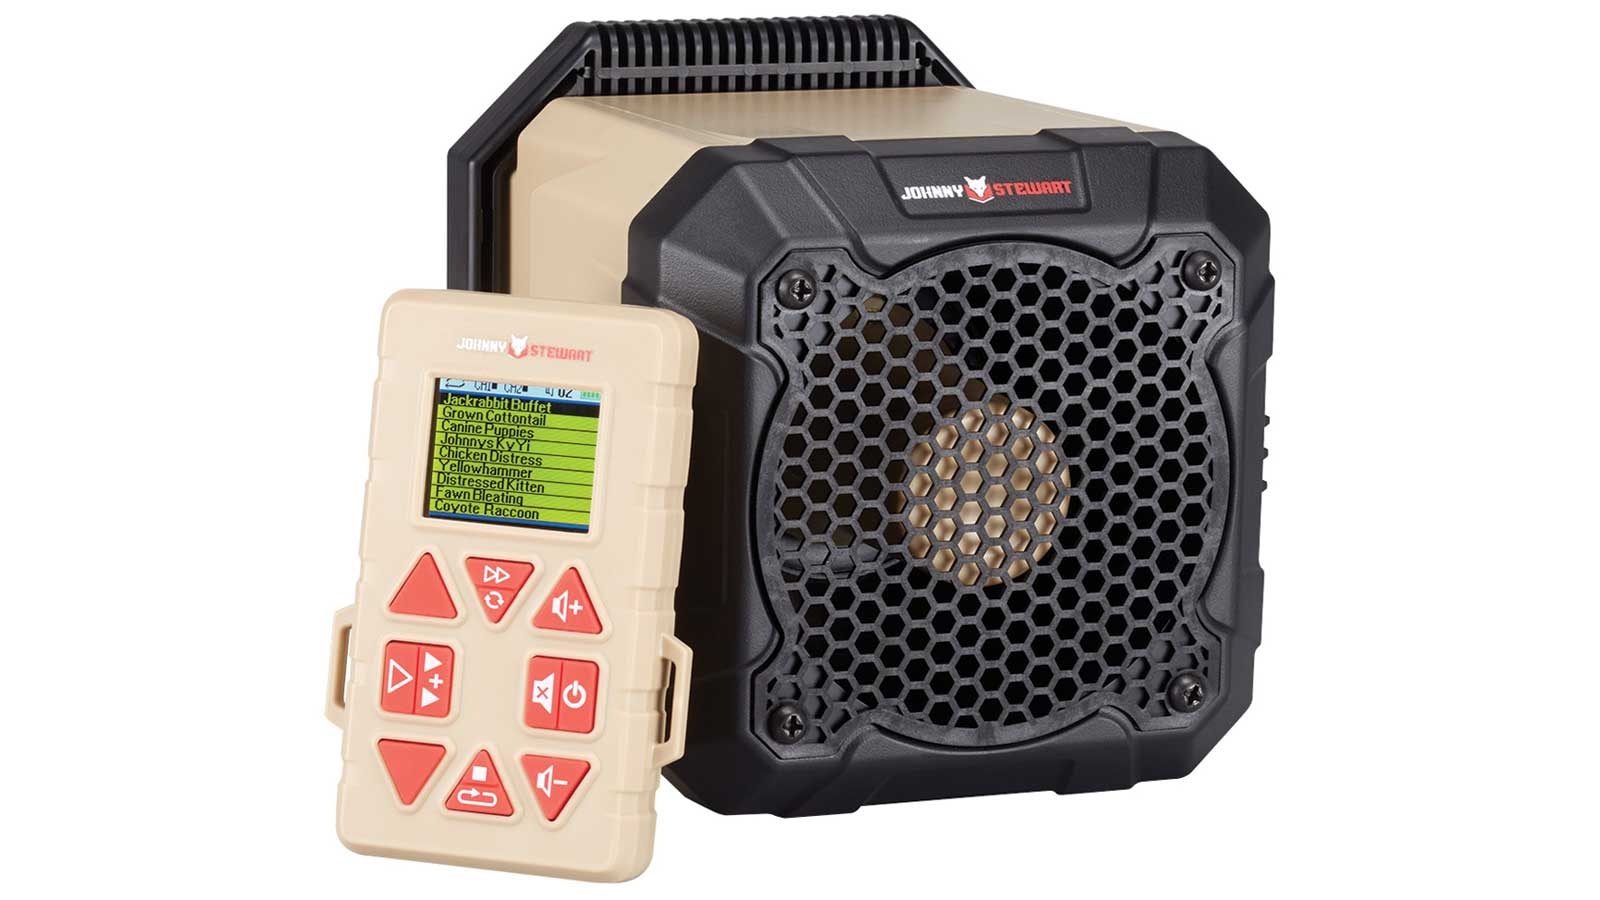 Hunters Specialties GS2 GRIM Speaker 10 Sounds Black|Tan